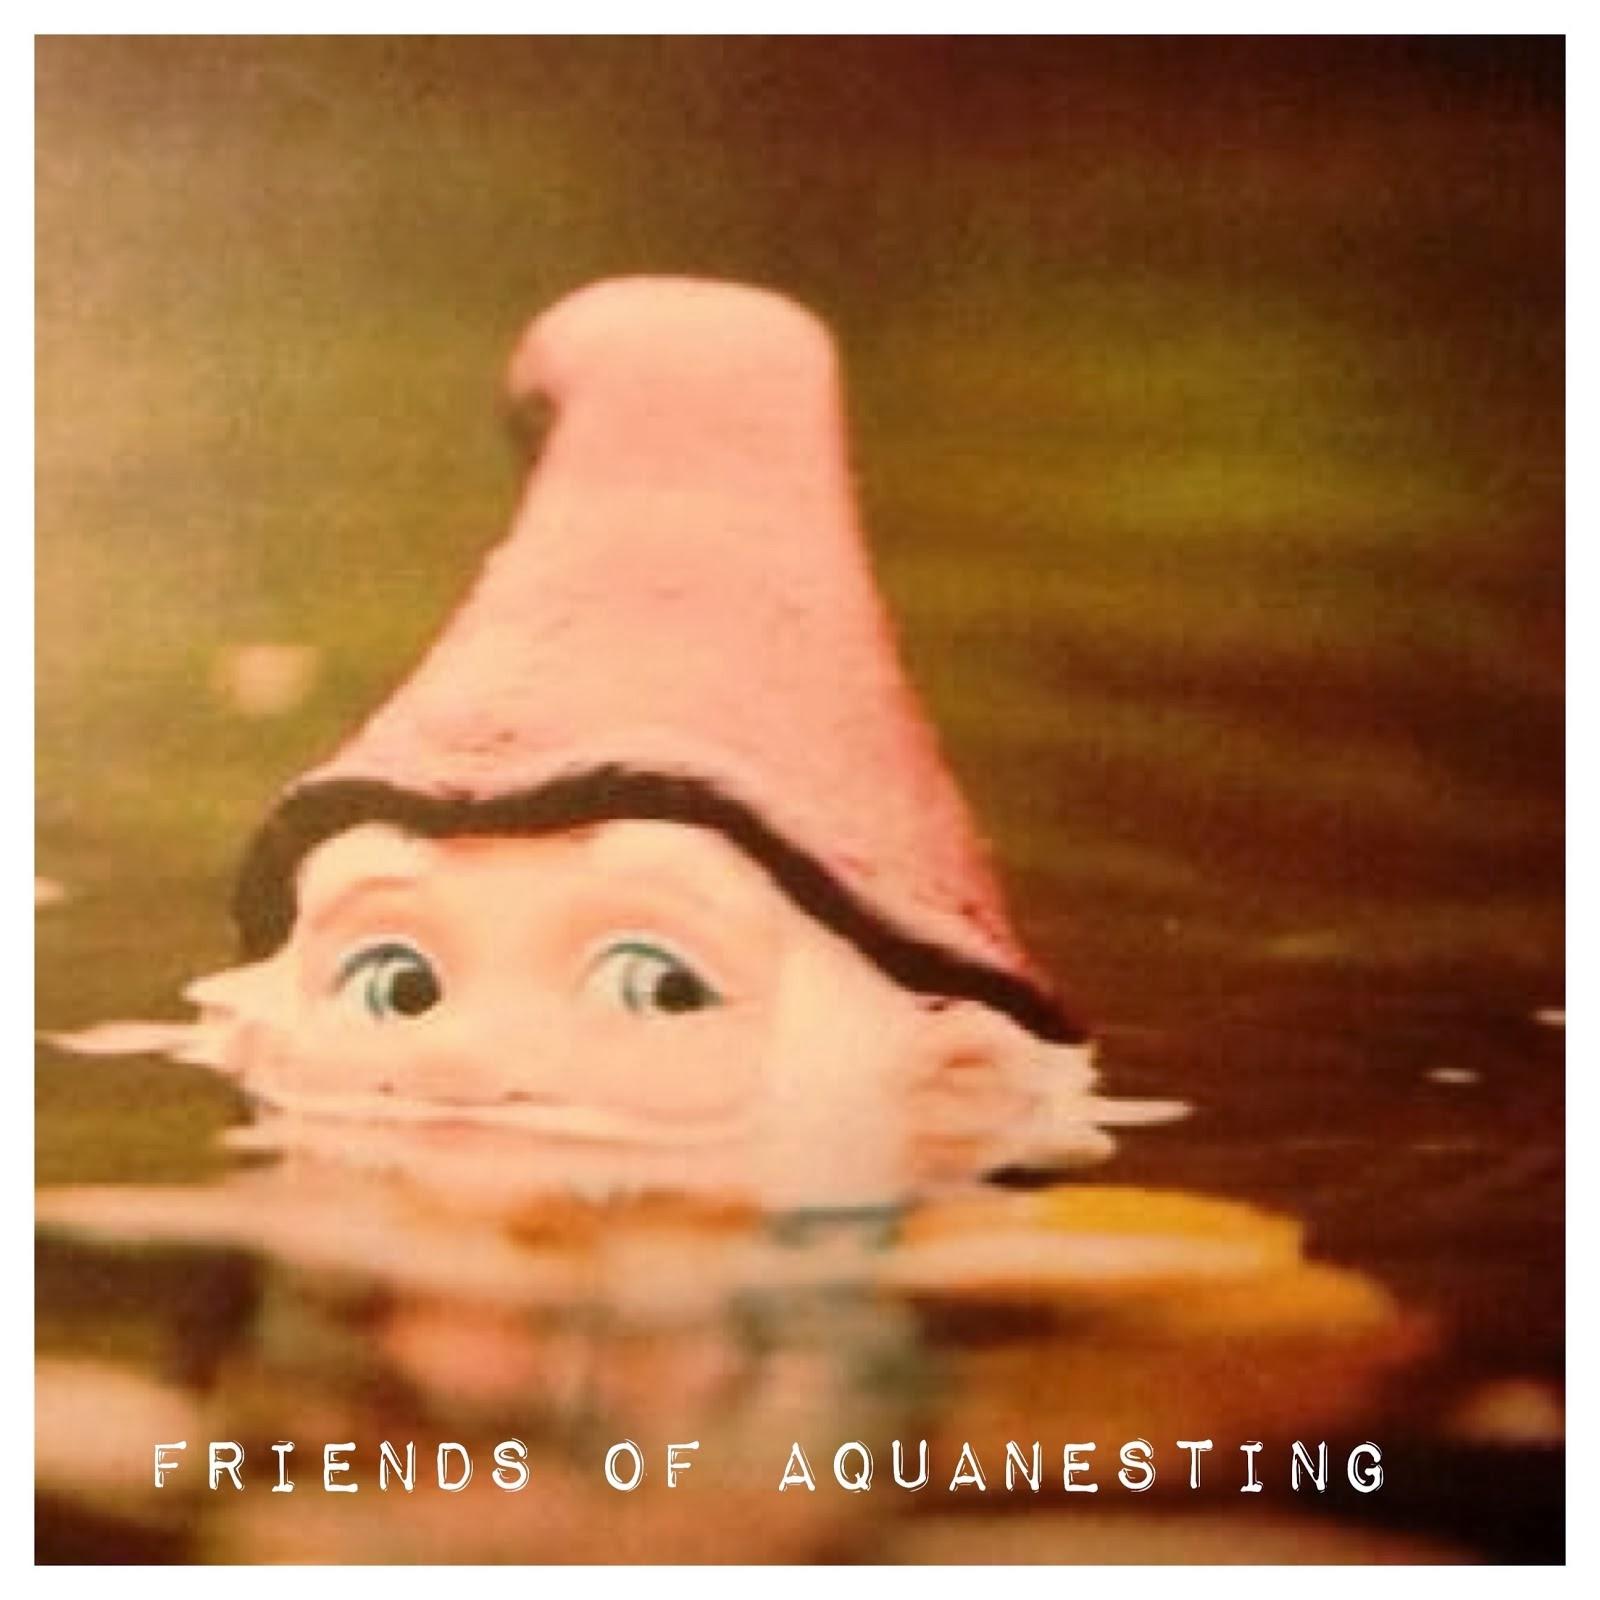 Marzo 2018: Friends of Aquanesting dal 16 al 18 marzo 2018